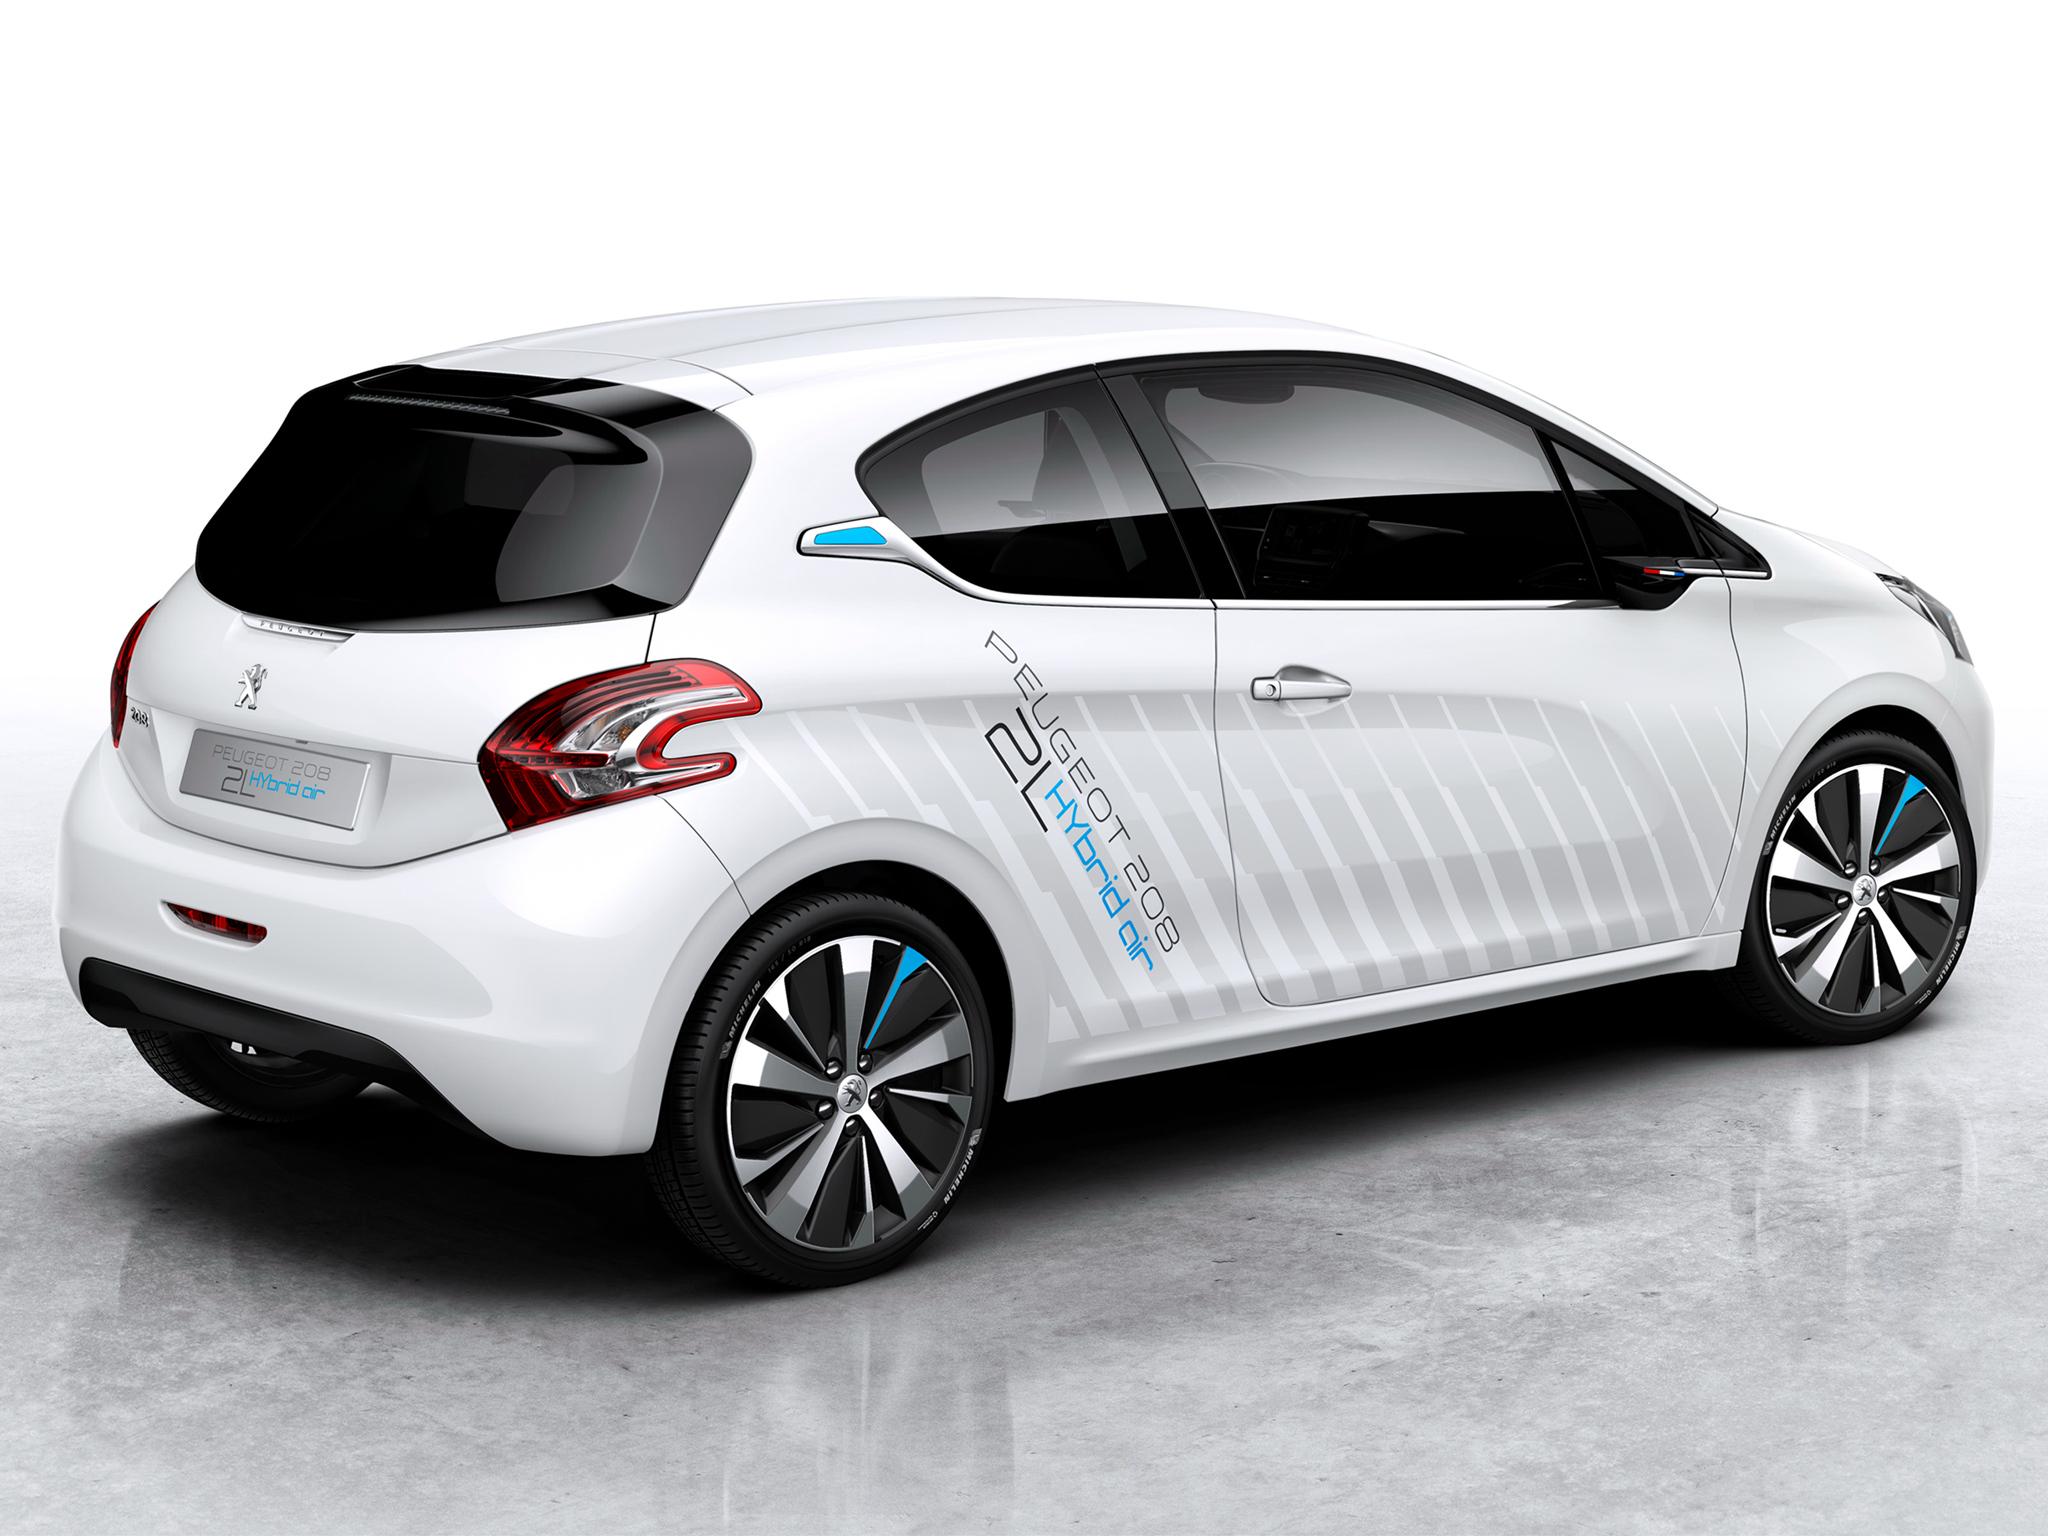 peugeot 208 hybrid air concept revealed ahead of paris. Black Bedroom Furniture Sets. Home Design Ideas